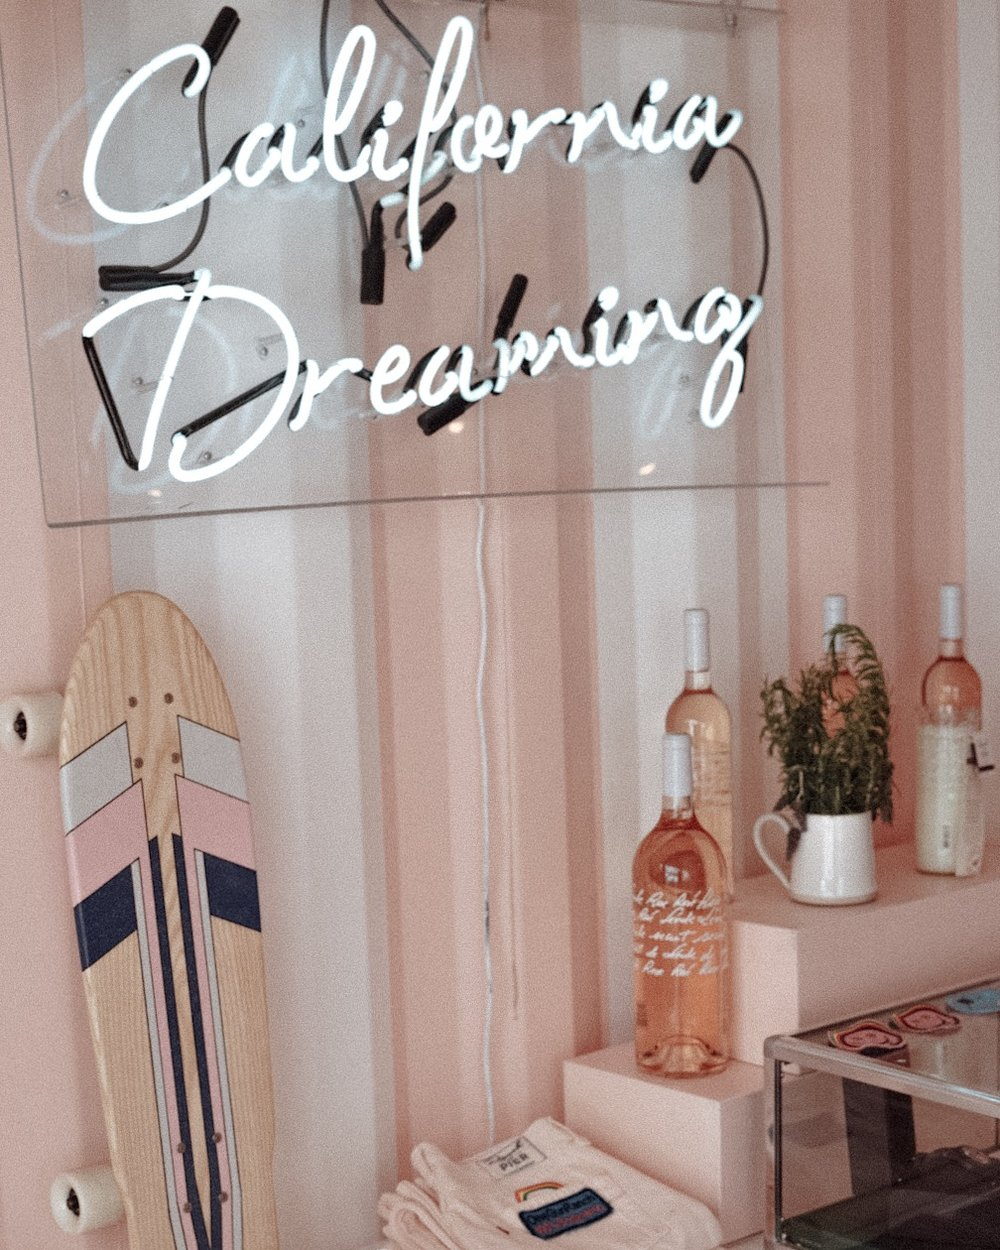 CALIFORNIA__DREAMING_MALIBU_BEACH